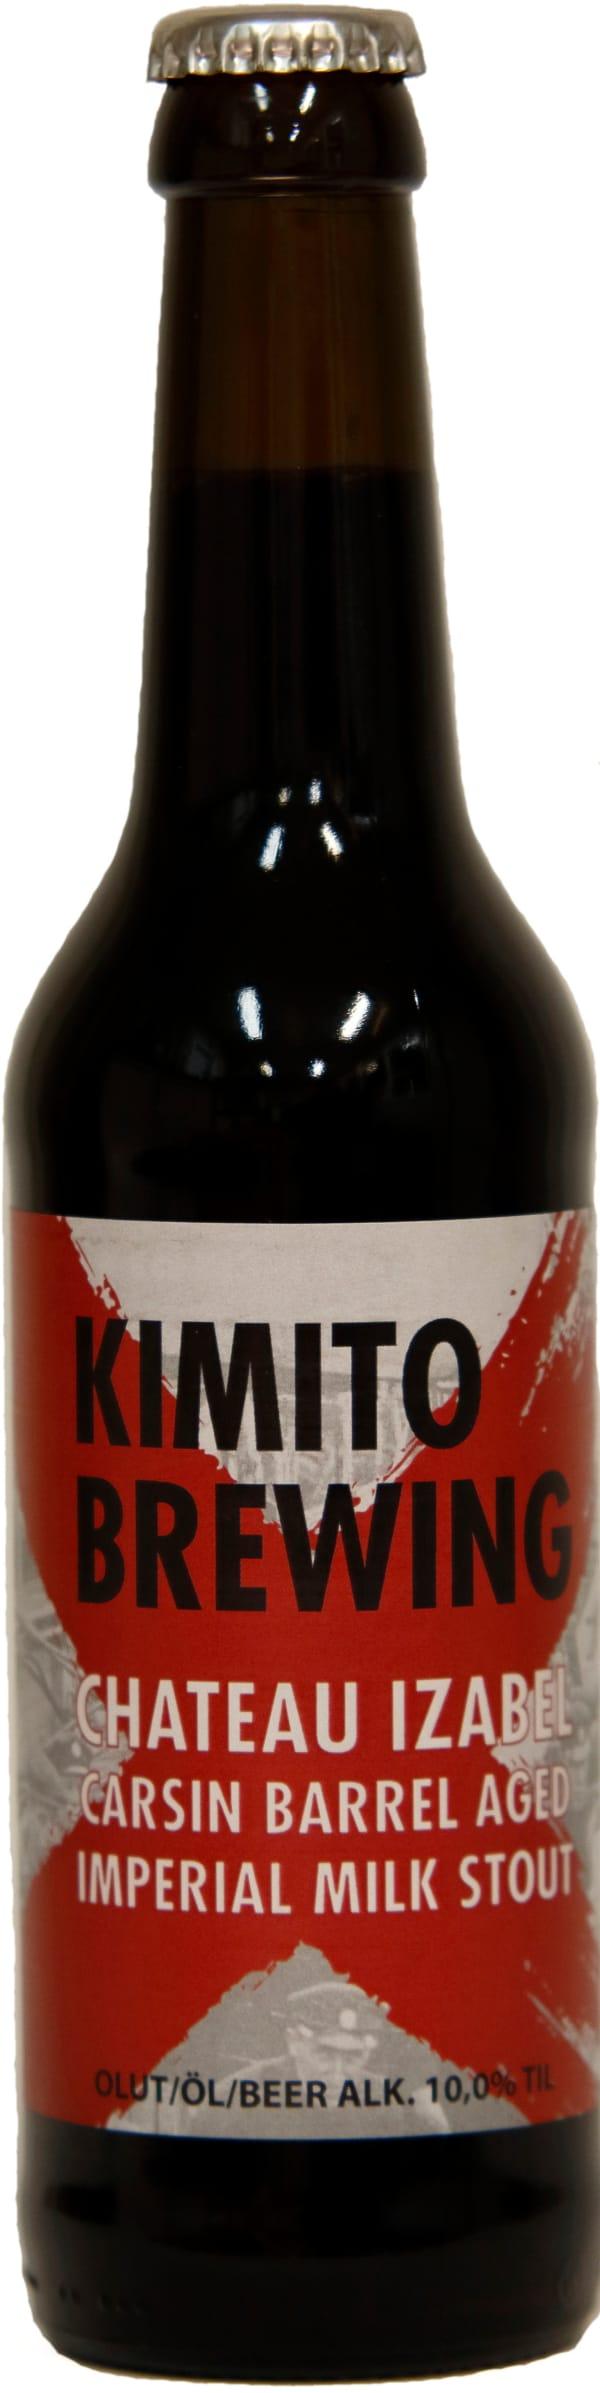 Kimito Chateau Izabel Carsin Barrel Aged Imperial Milk Stout